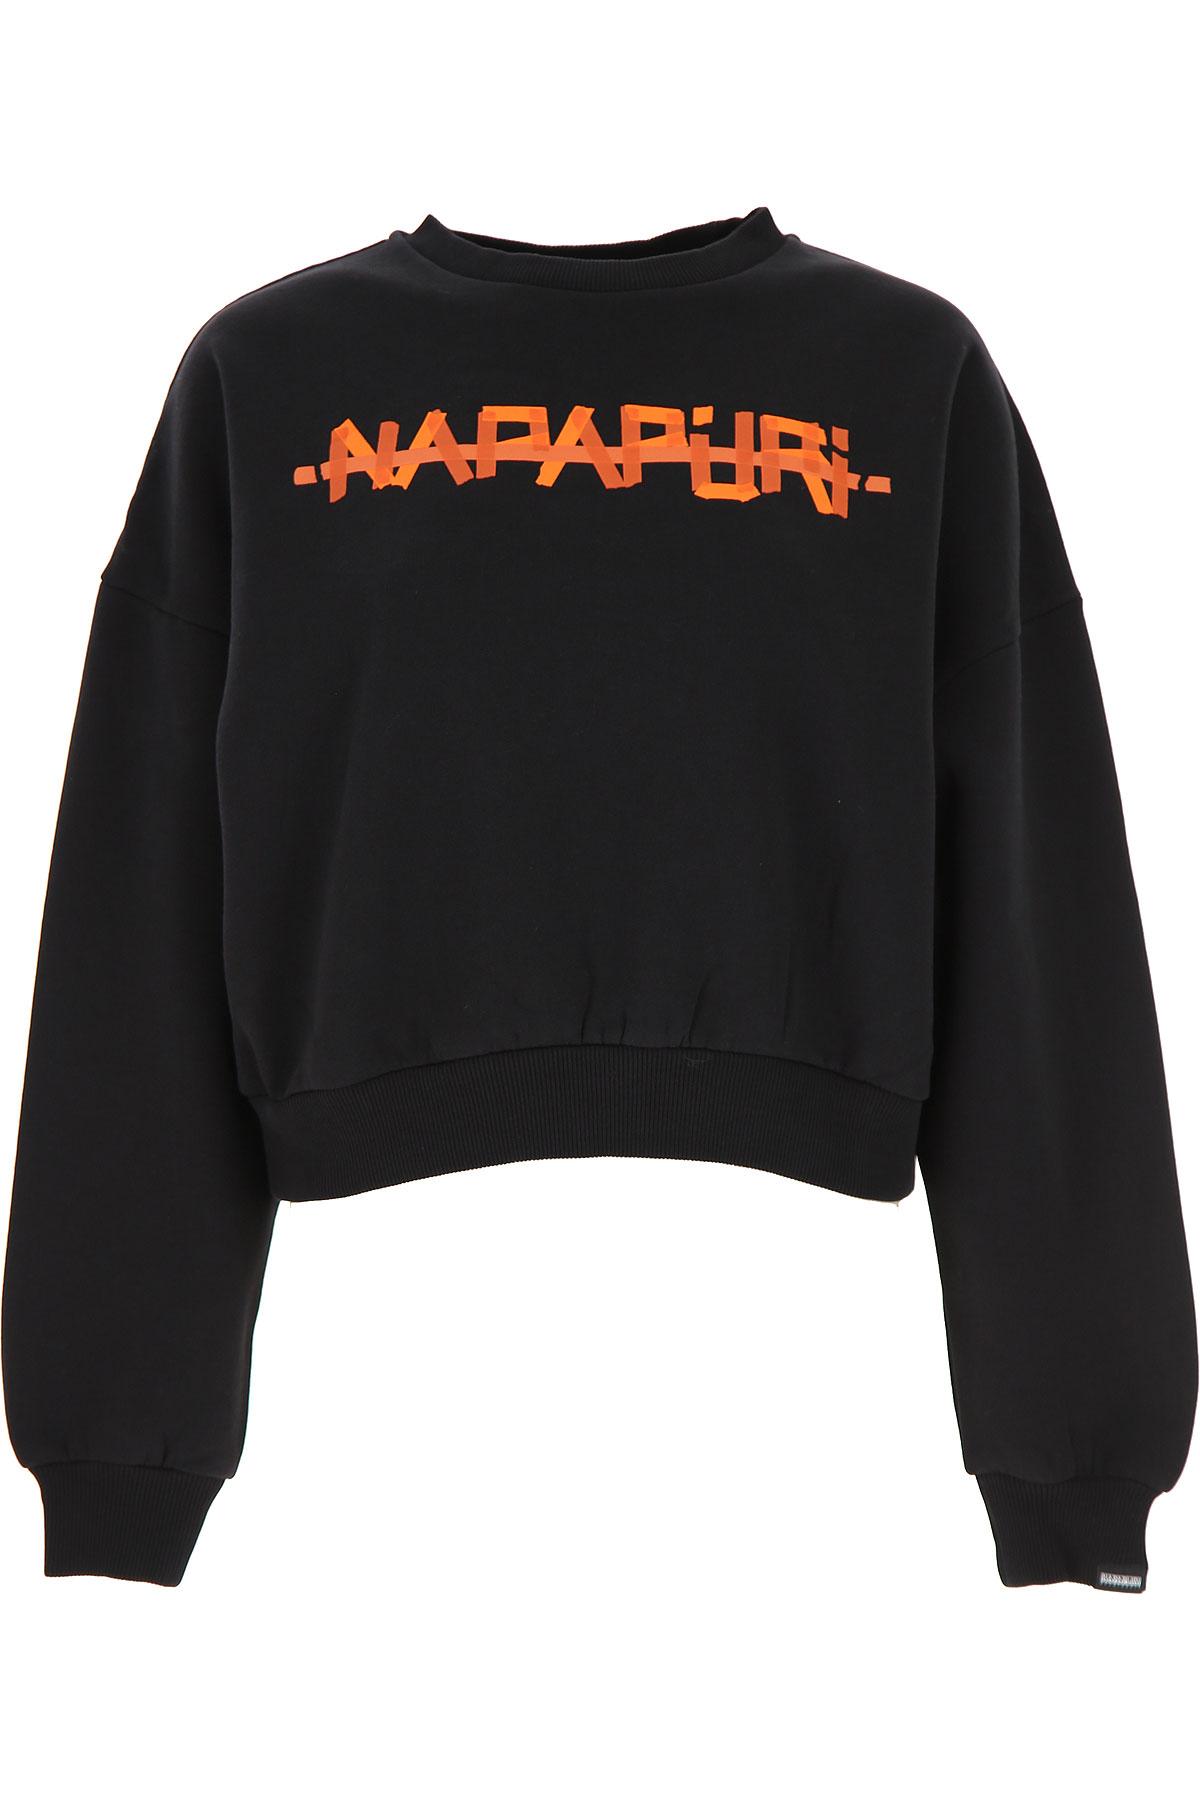 Napapijri Sweatshirt for Women On Sale, Black, Cotton, 2019, 2 4 6 8